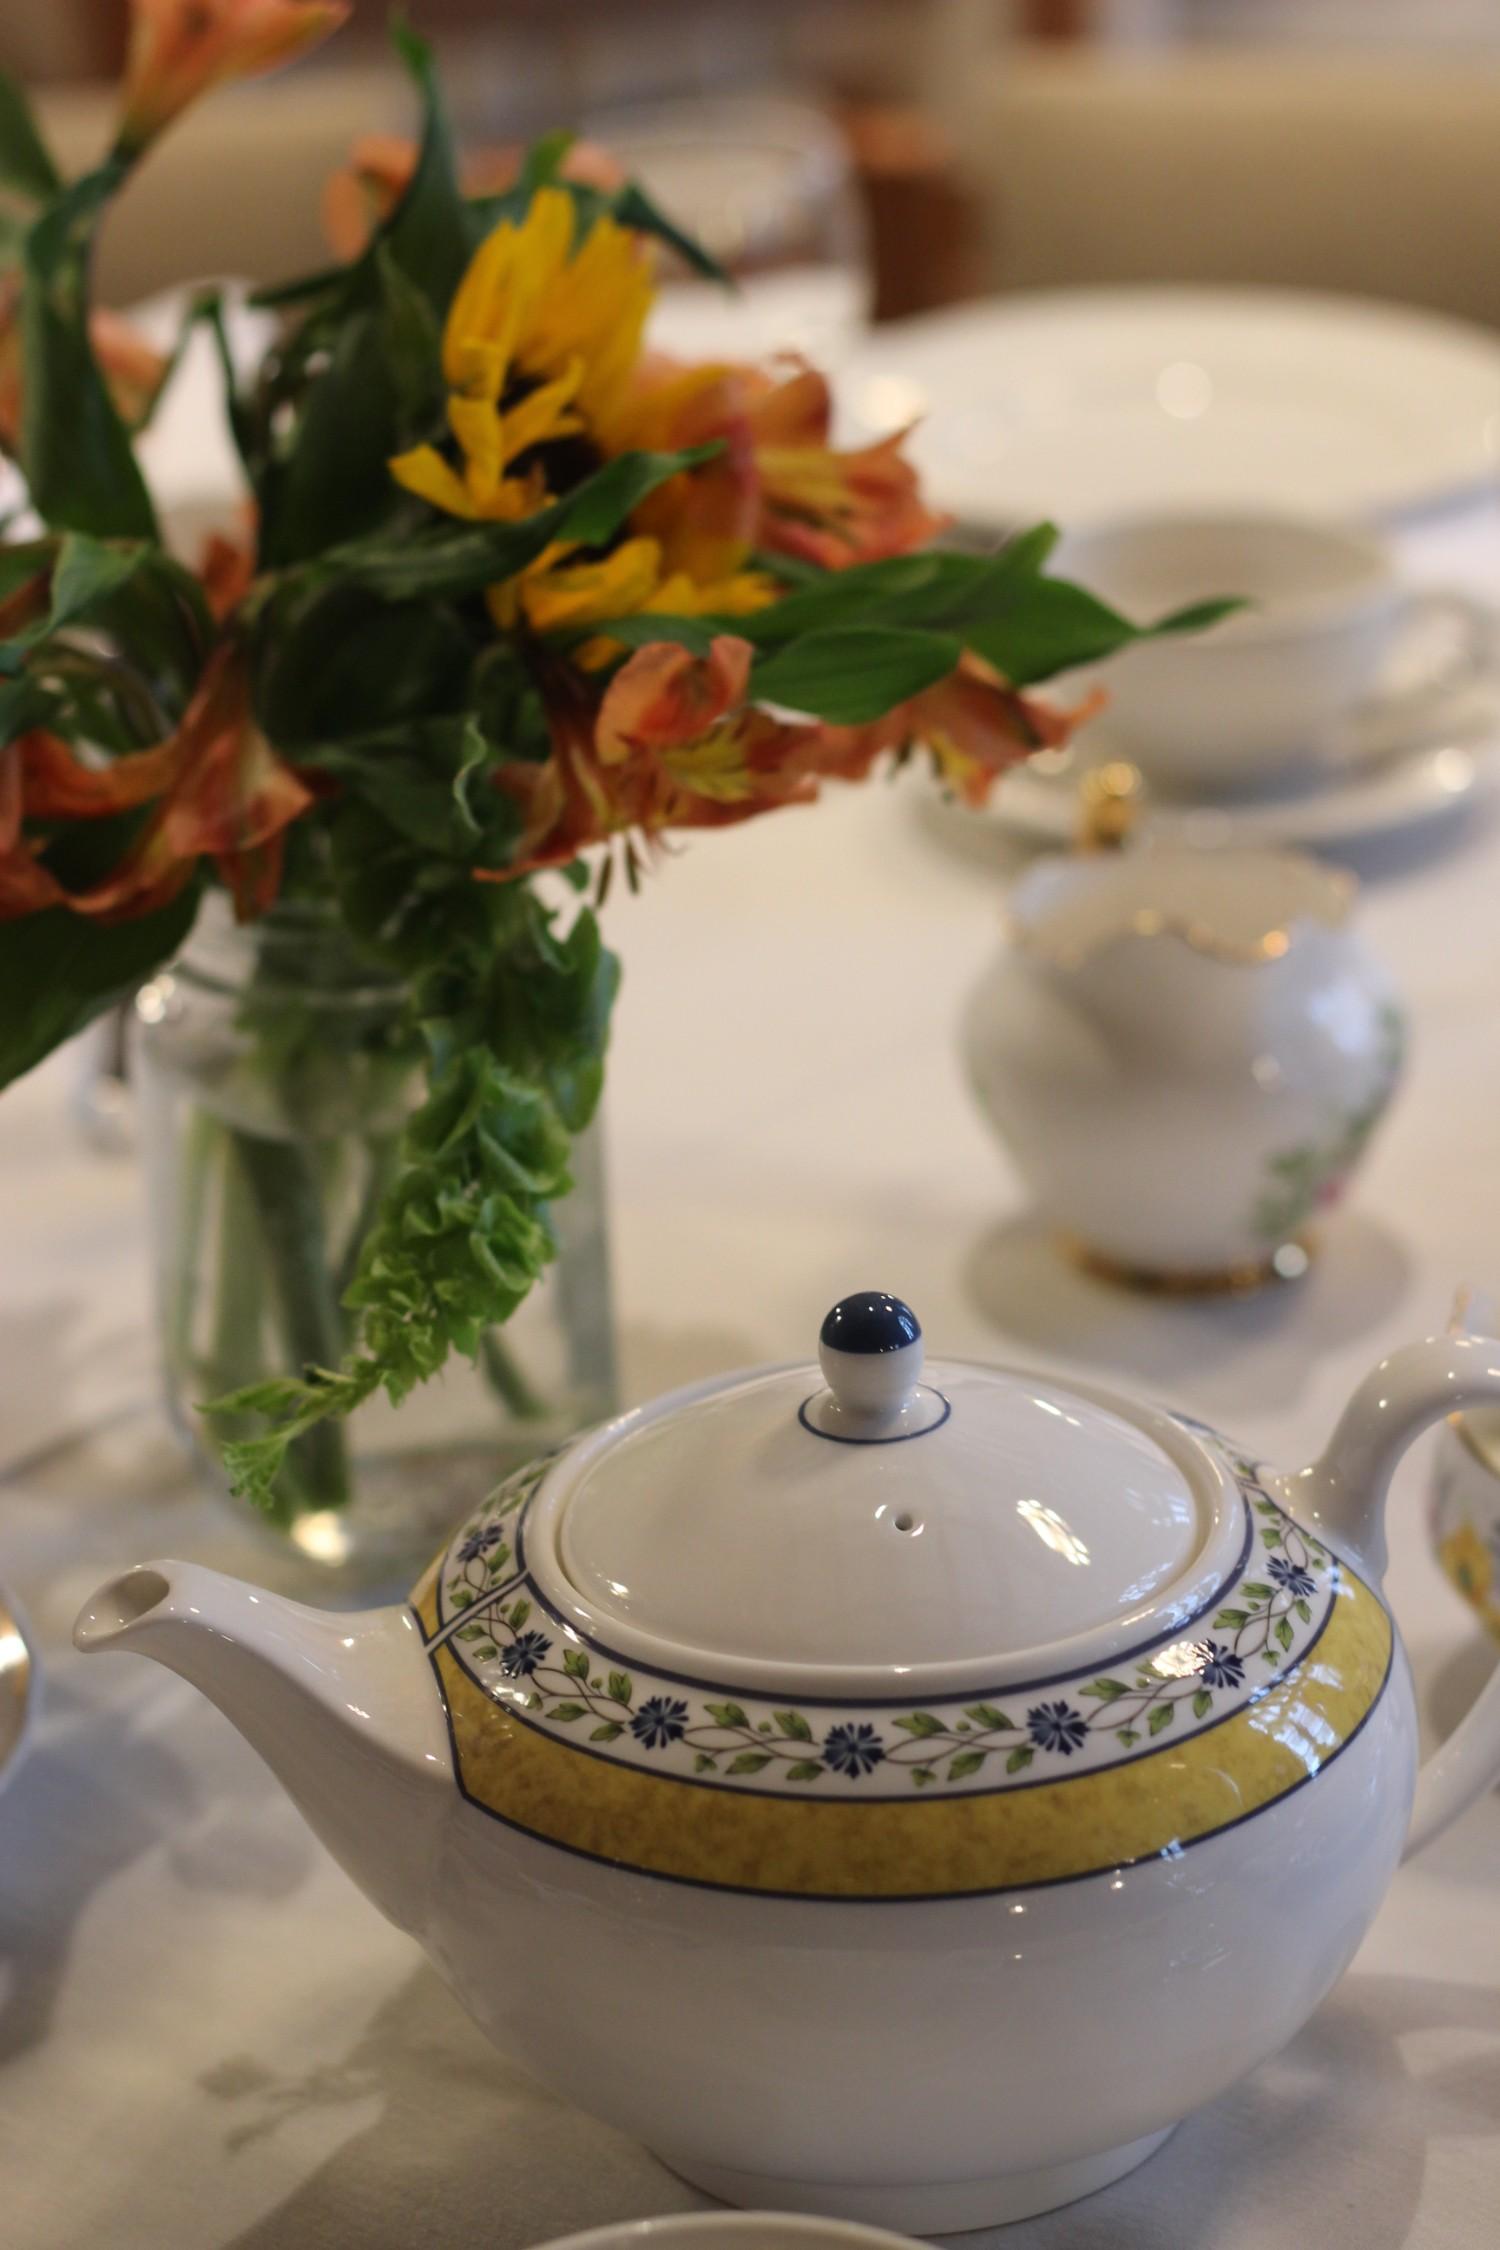 2018-Shadwell-Tea-SGSNY-St-Georges-Society-Beneficiary-Program (44).jpg